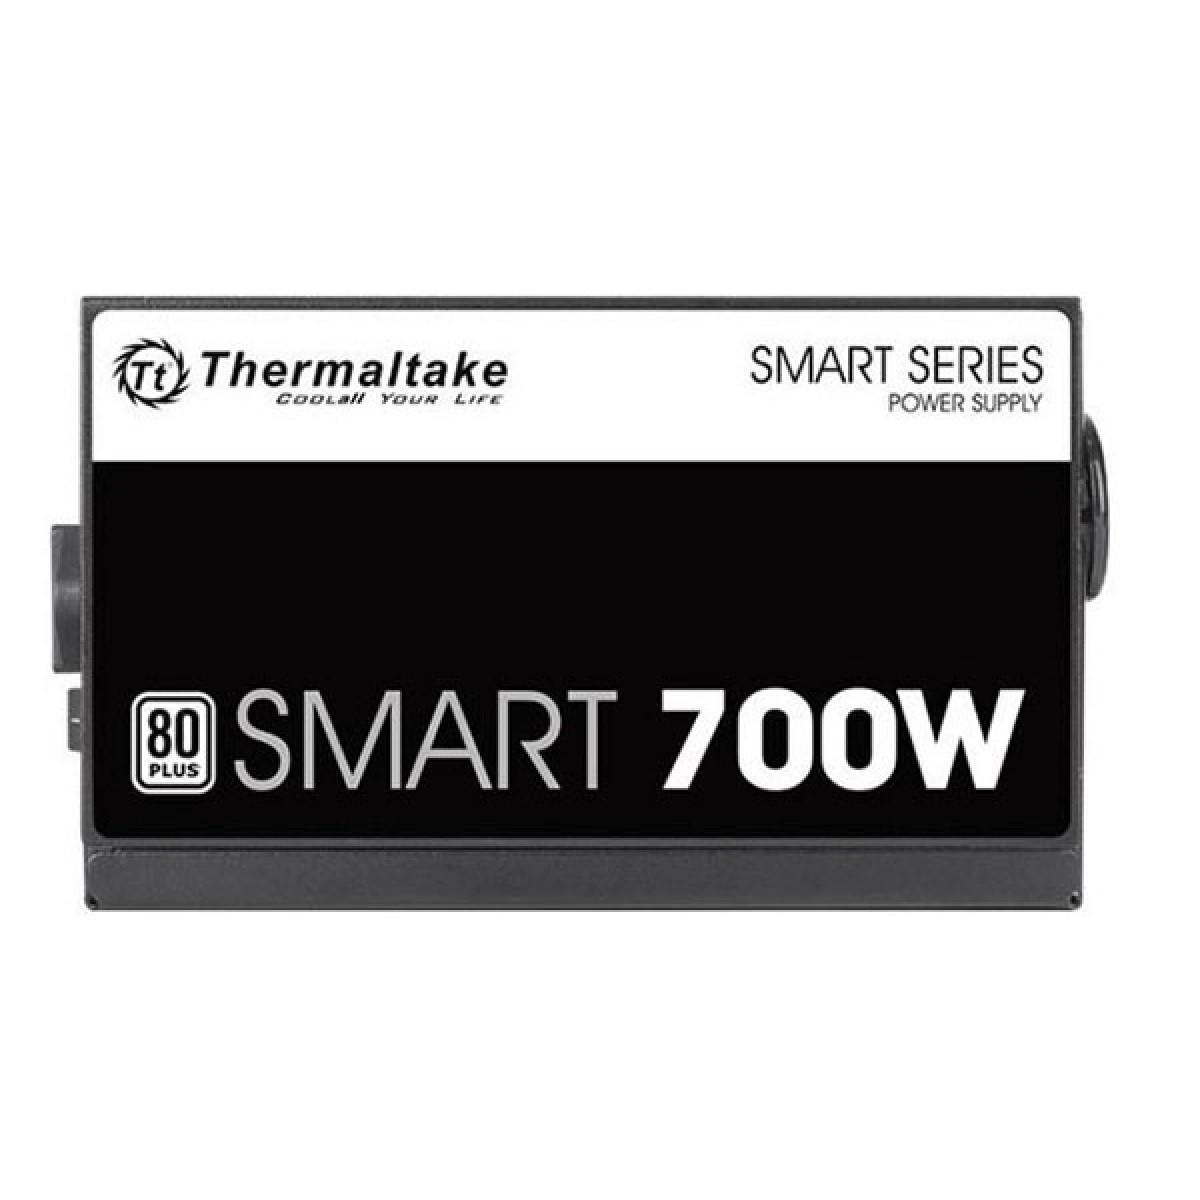 Fonte Thermaltake Smart Series 700W PS-SPD-0700P PFC Ativo Cabos Flat